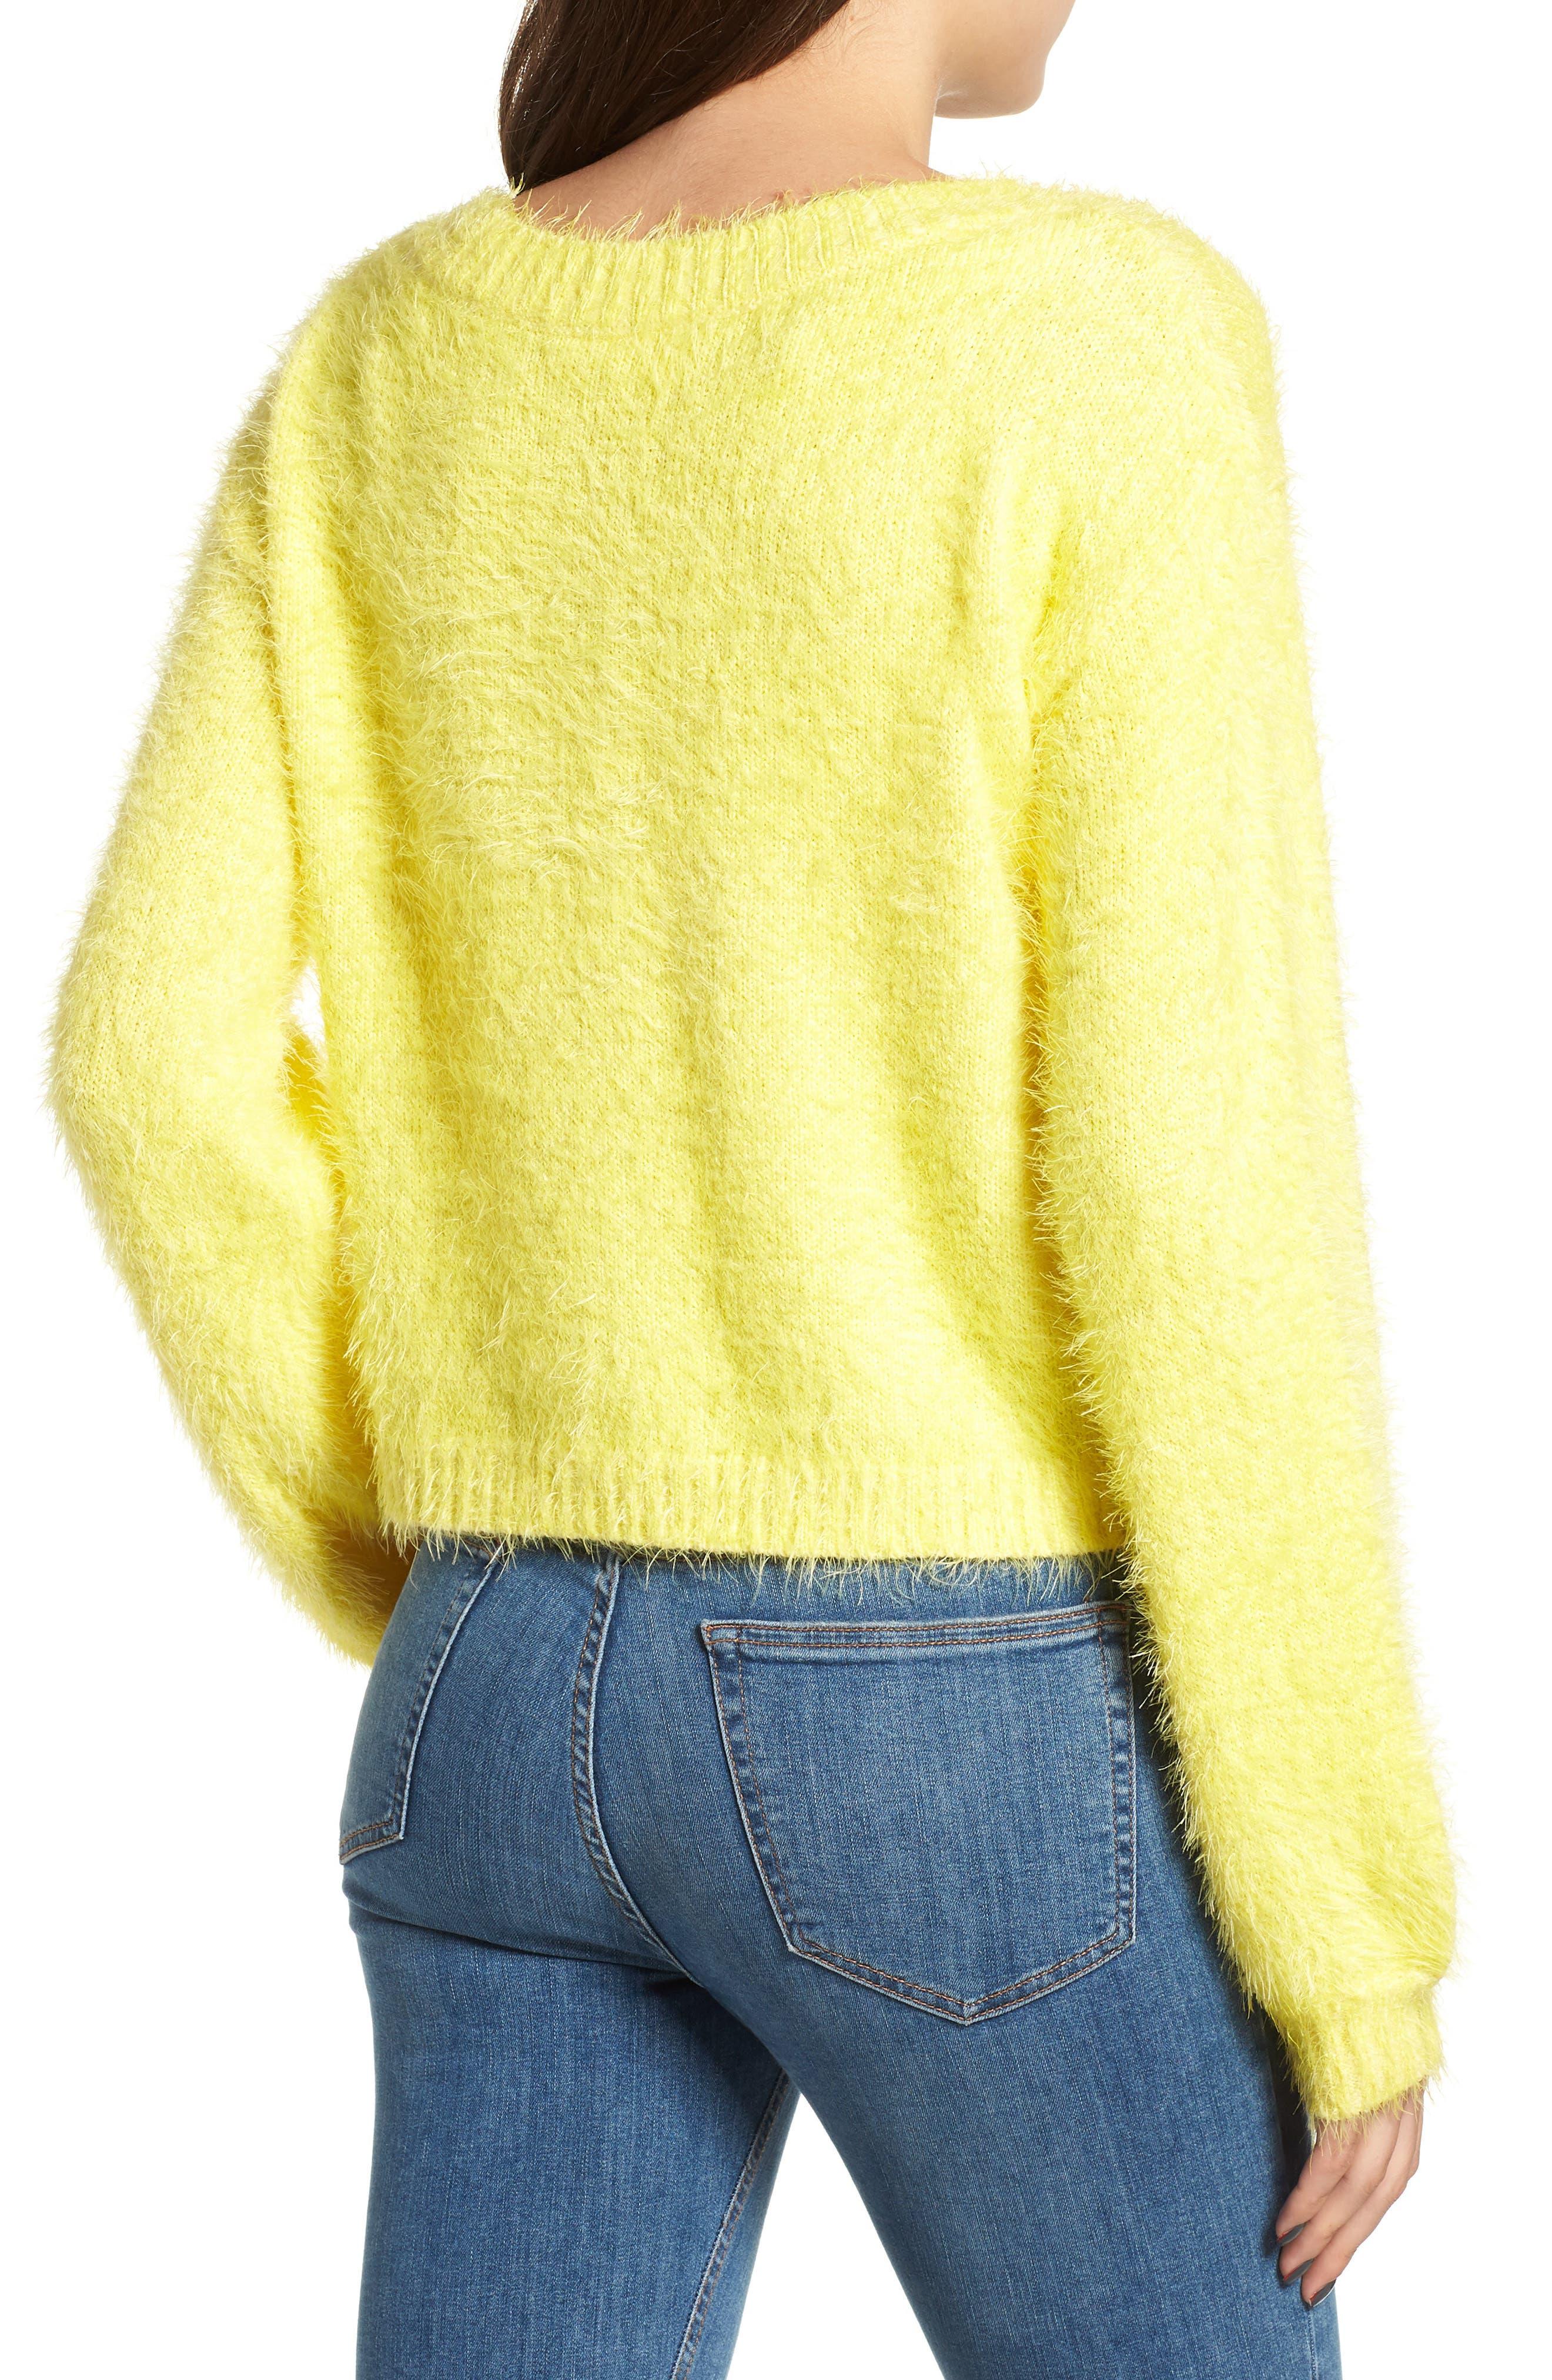 Clover Fields Chenille Sweater,                             Alternate thumbnail 2, color,                             MARIGOLD